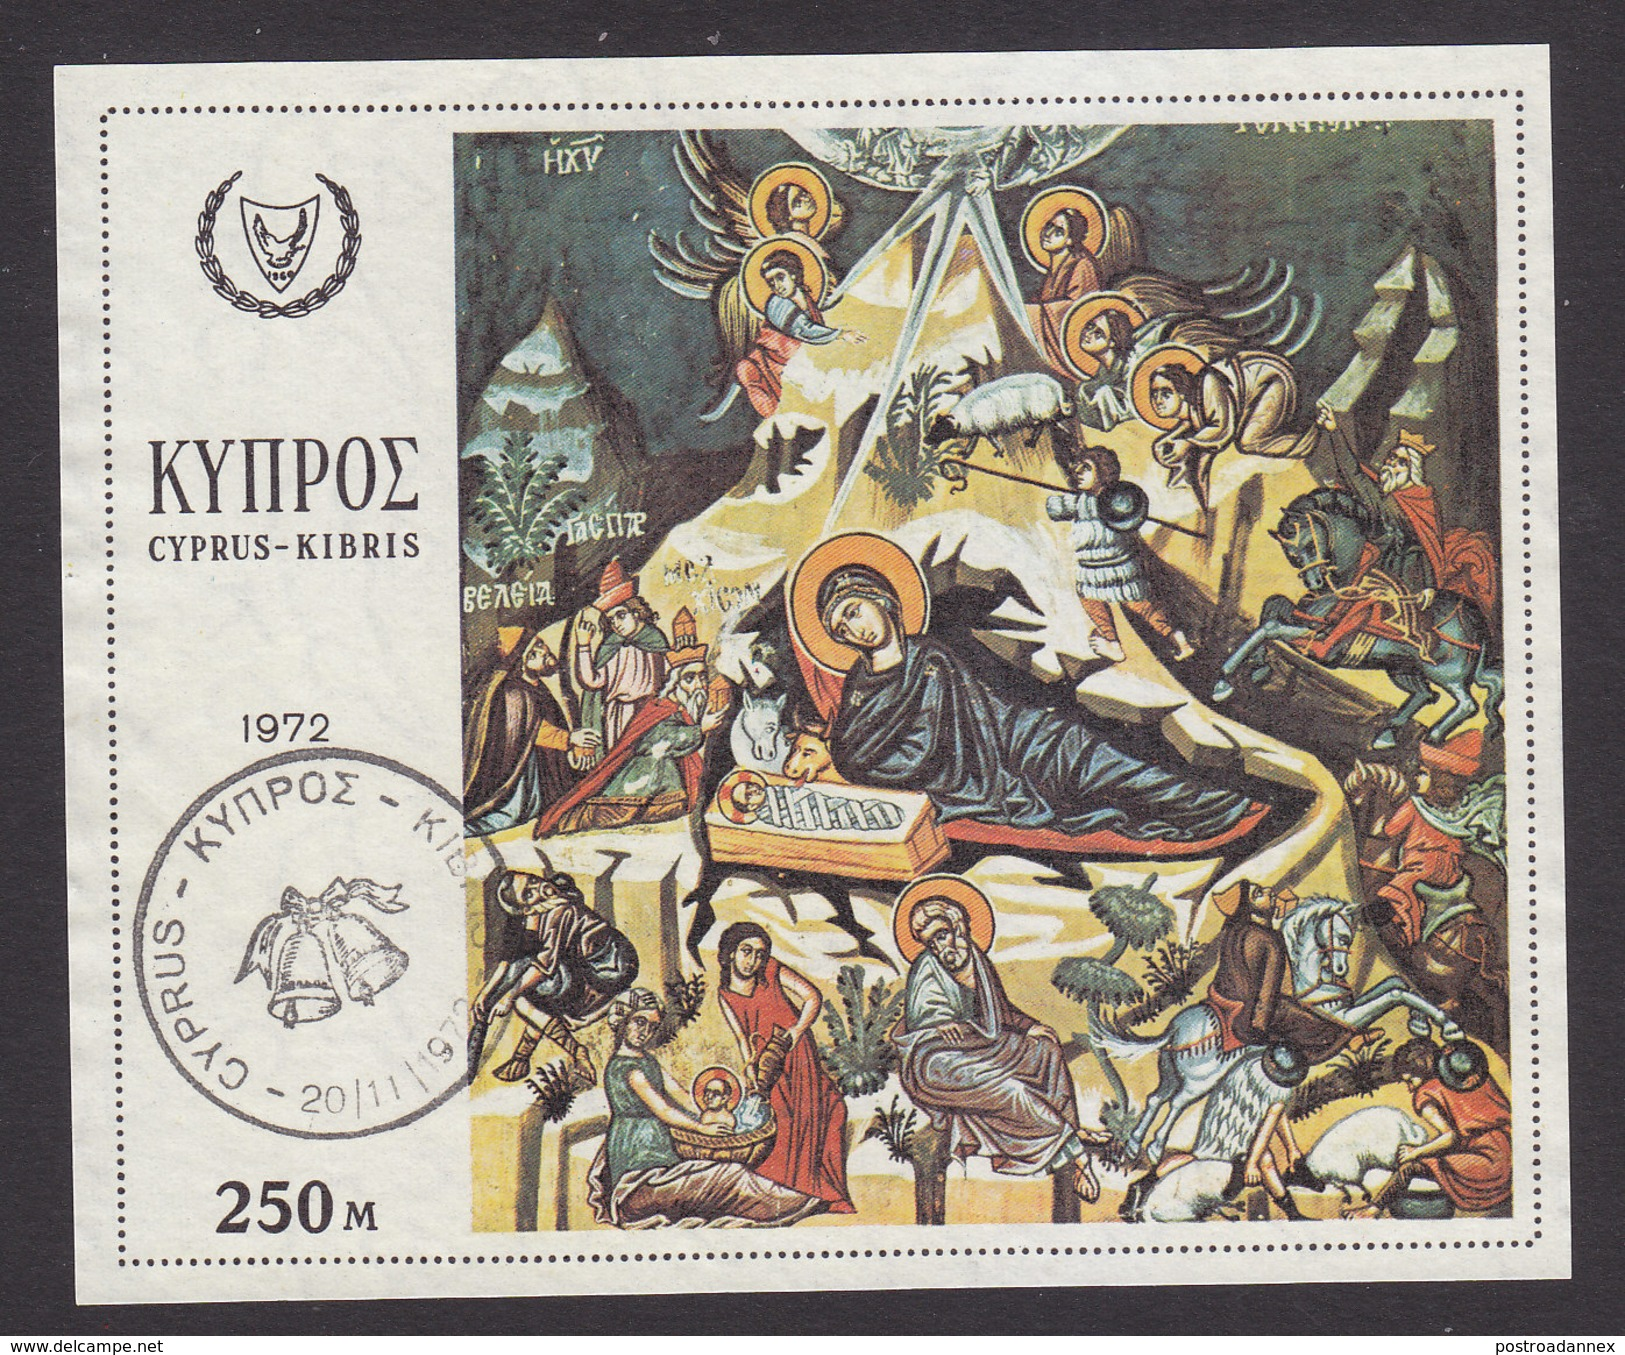 Cyprus, Scott #393, Used, Christmas, Issued 1972 - Cyprus (Republic)